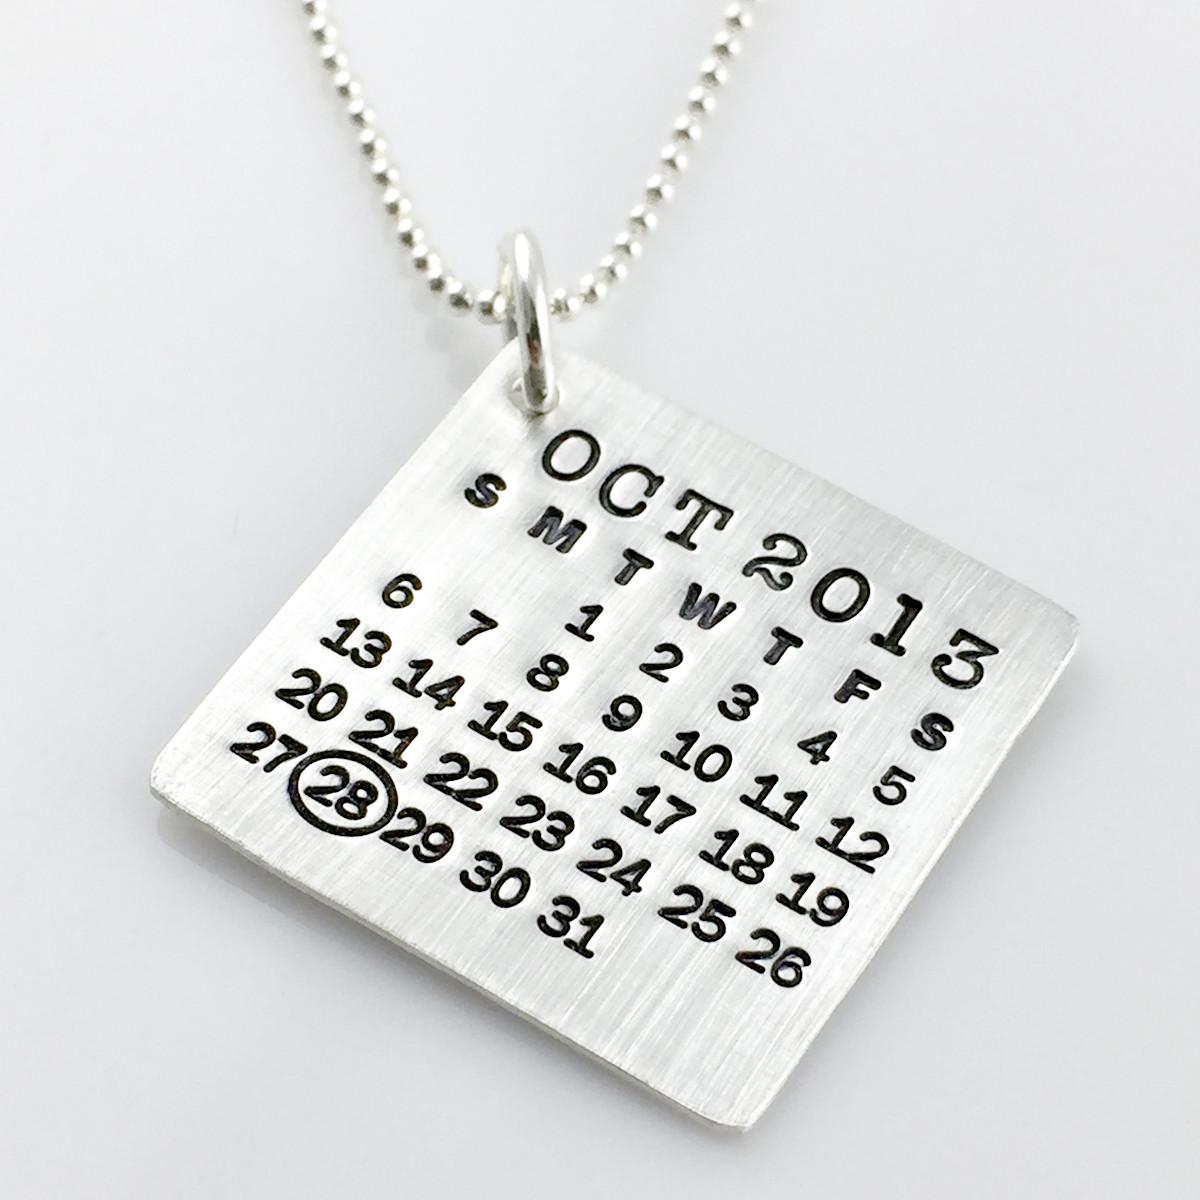 Mark Your Calendar Necklace with oval highlight